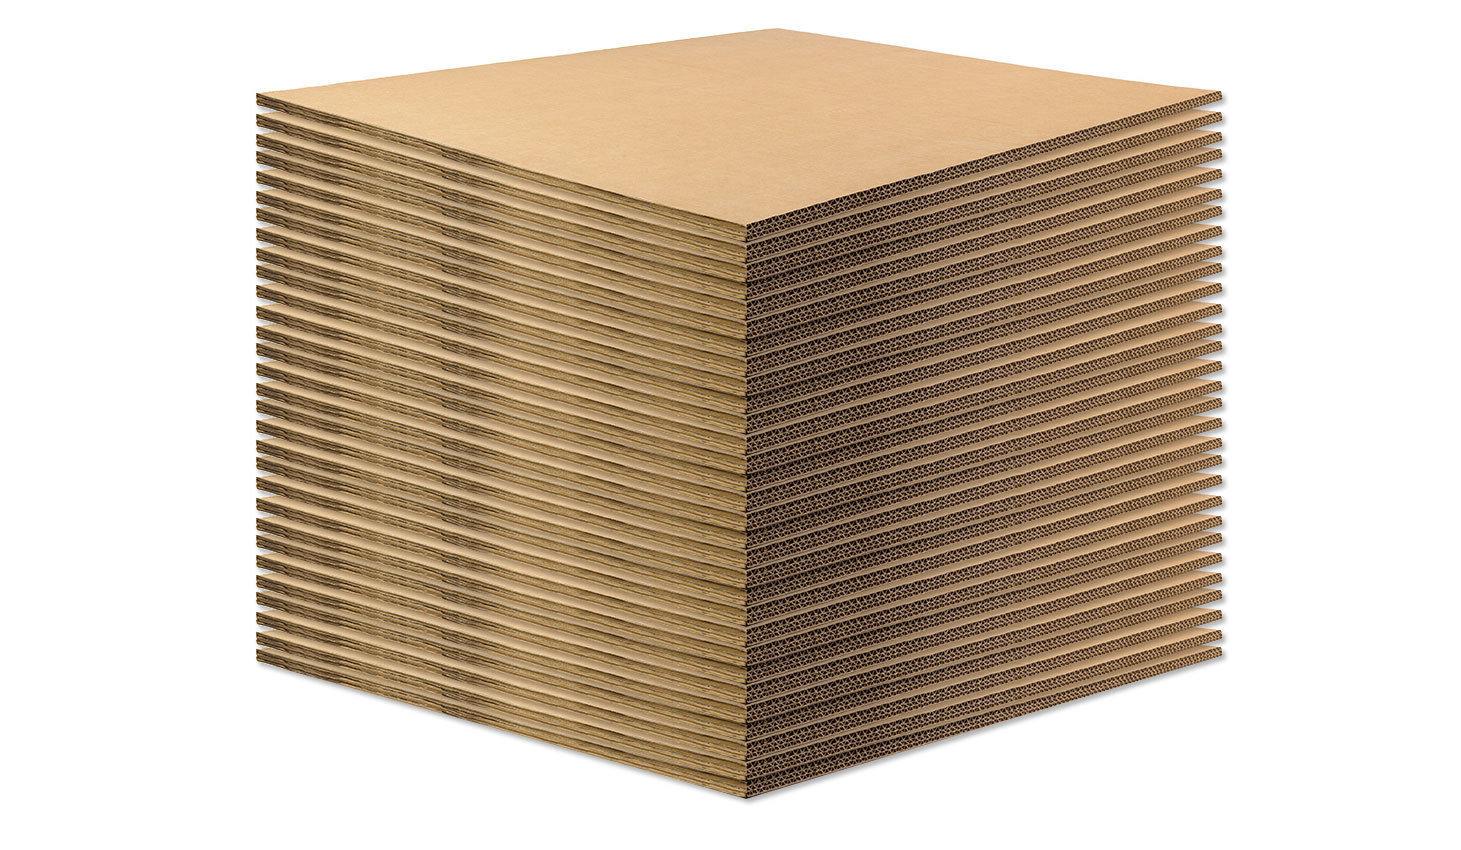 BASE IN CARTONE per ECOPALLET  80x60cm x 14mm • 50 pezzi